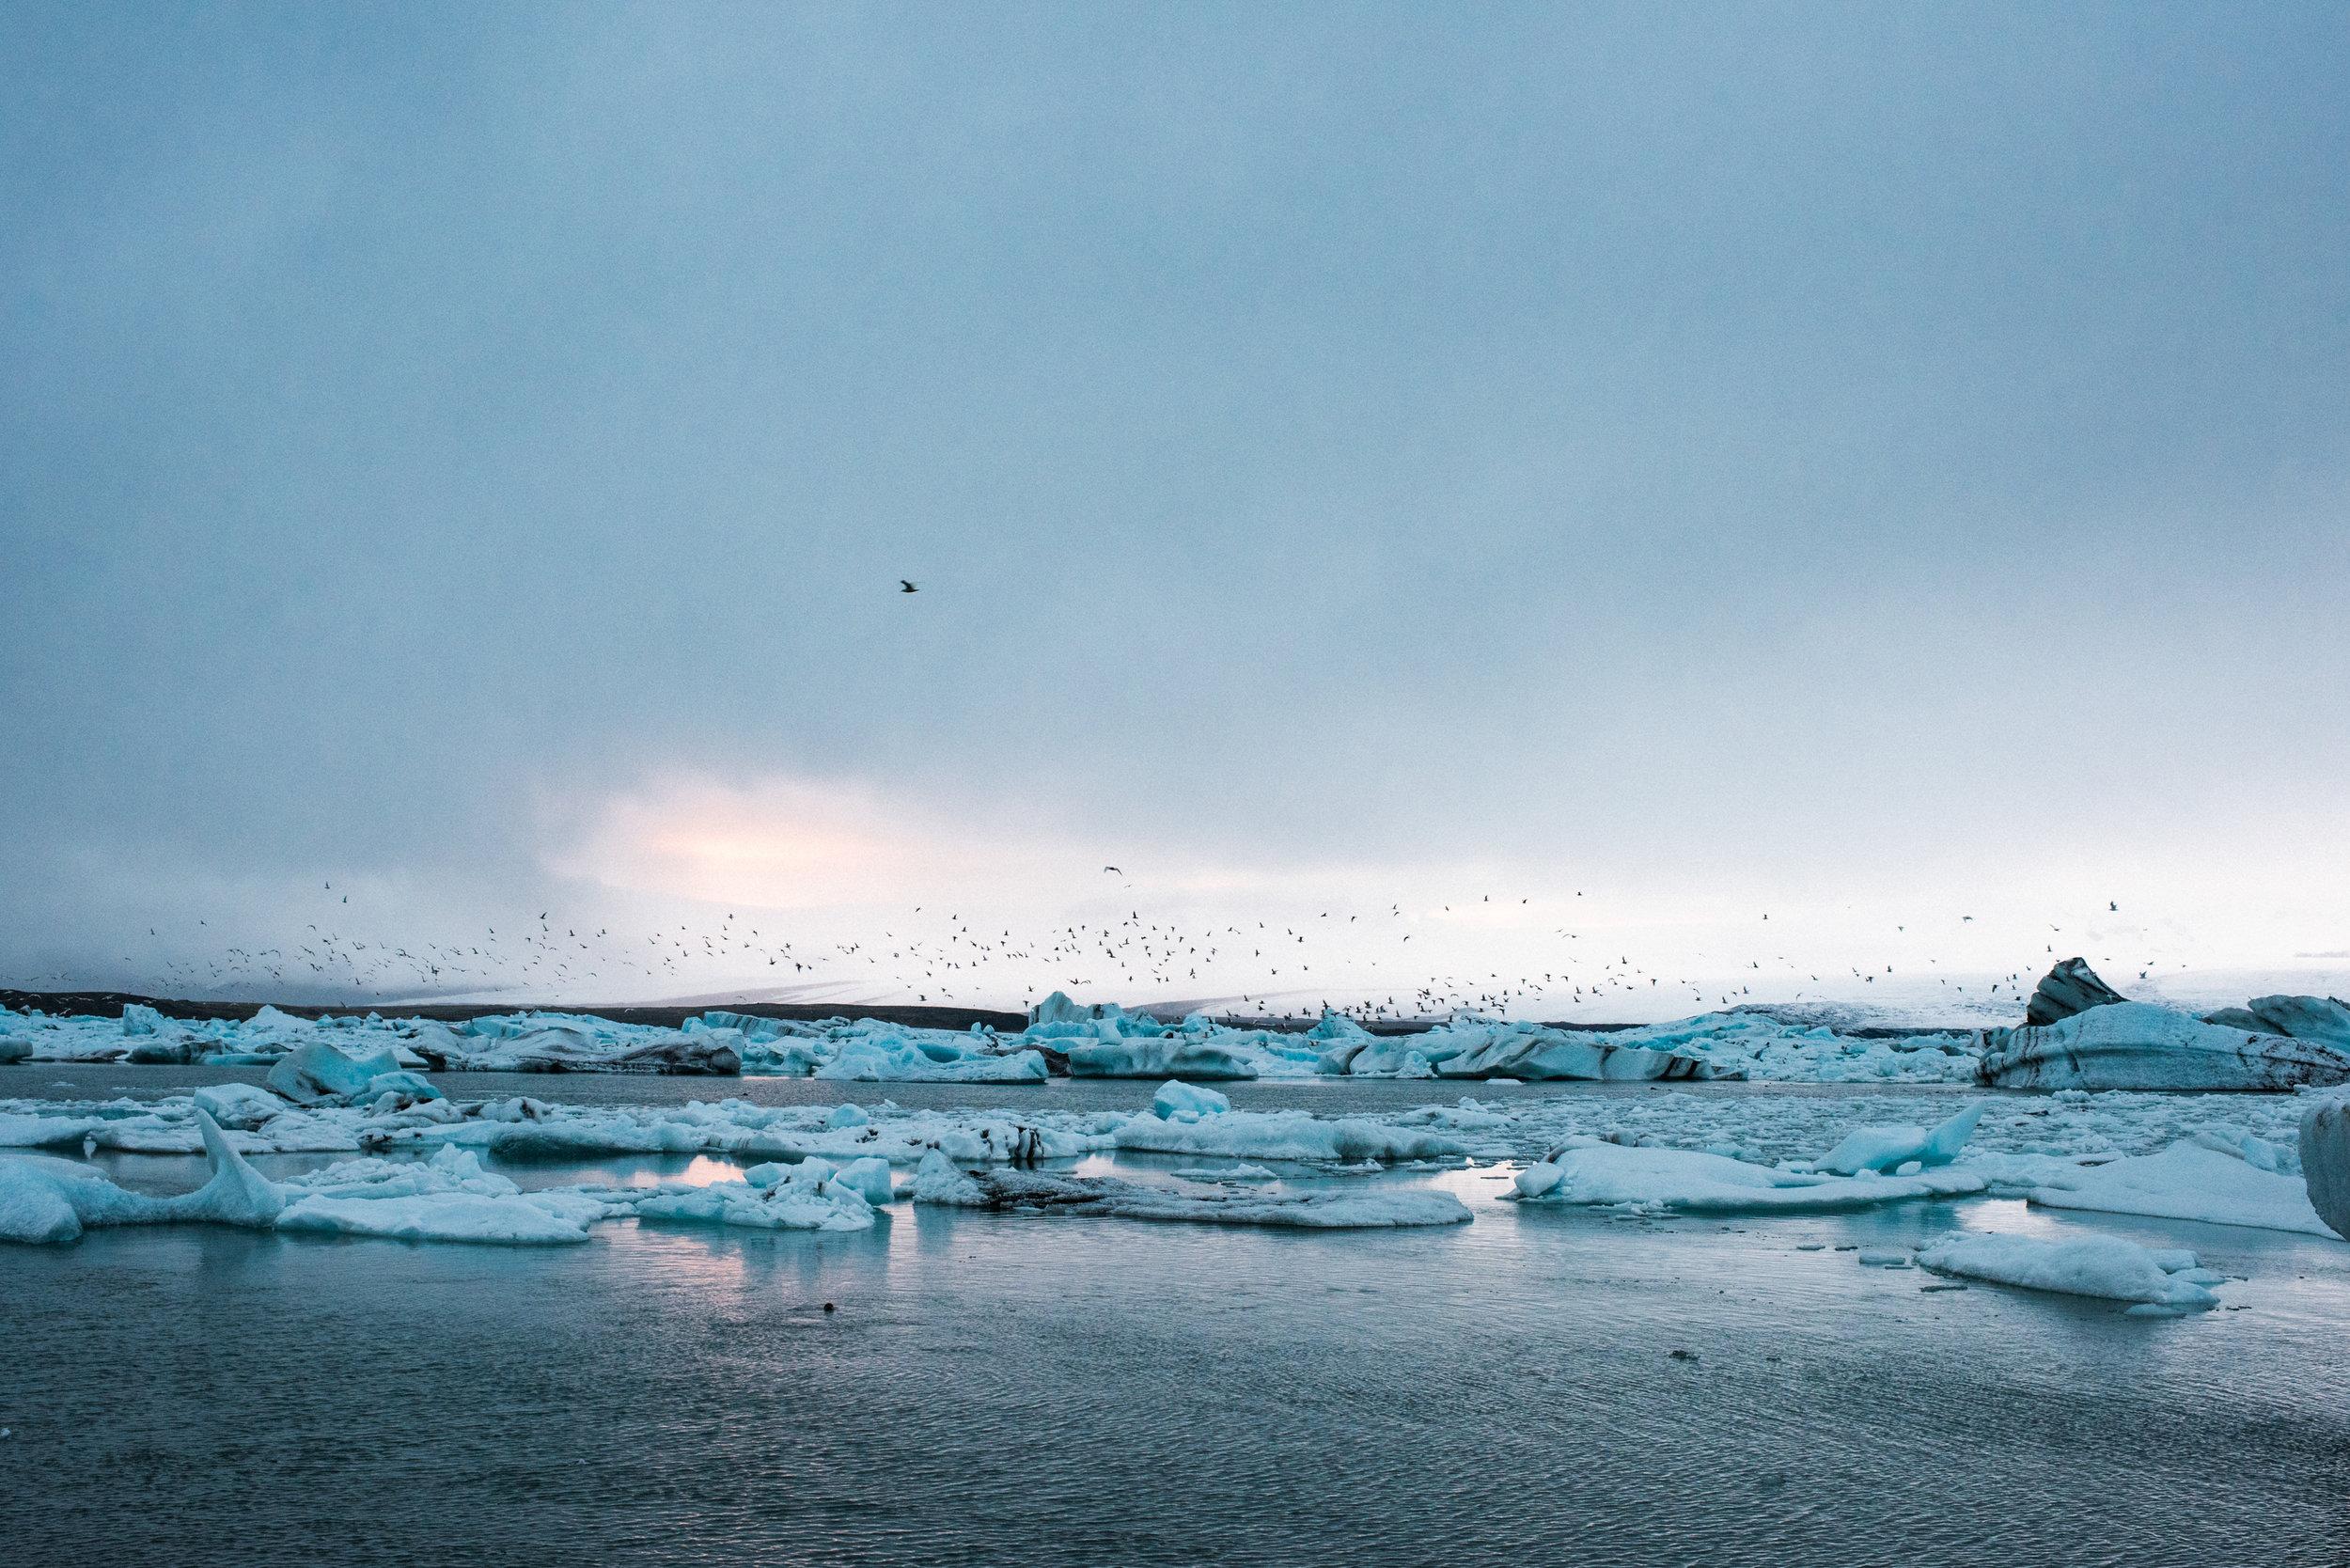 ICELAND_WOMAN_PHOTOGRAPHER_TARASHUPE_OUTDOOR_PHOTOGRAPHY_086.jpg